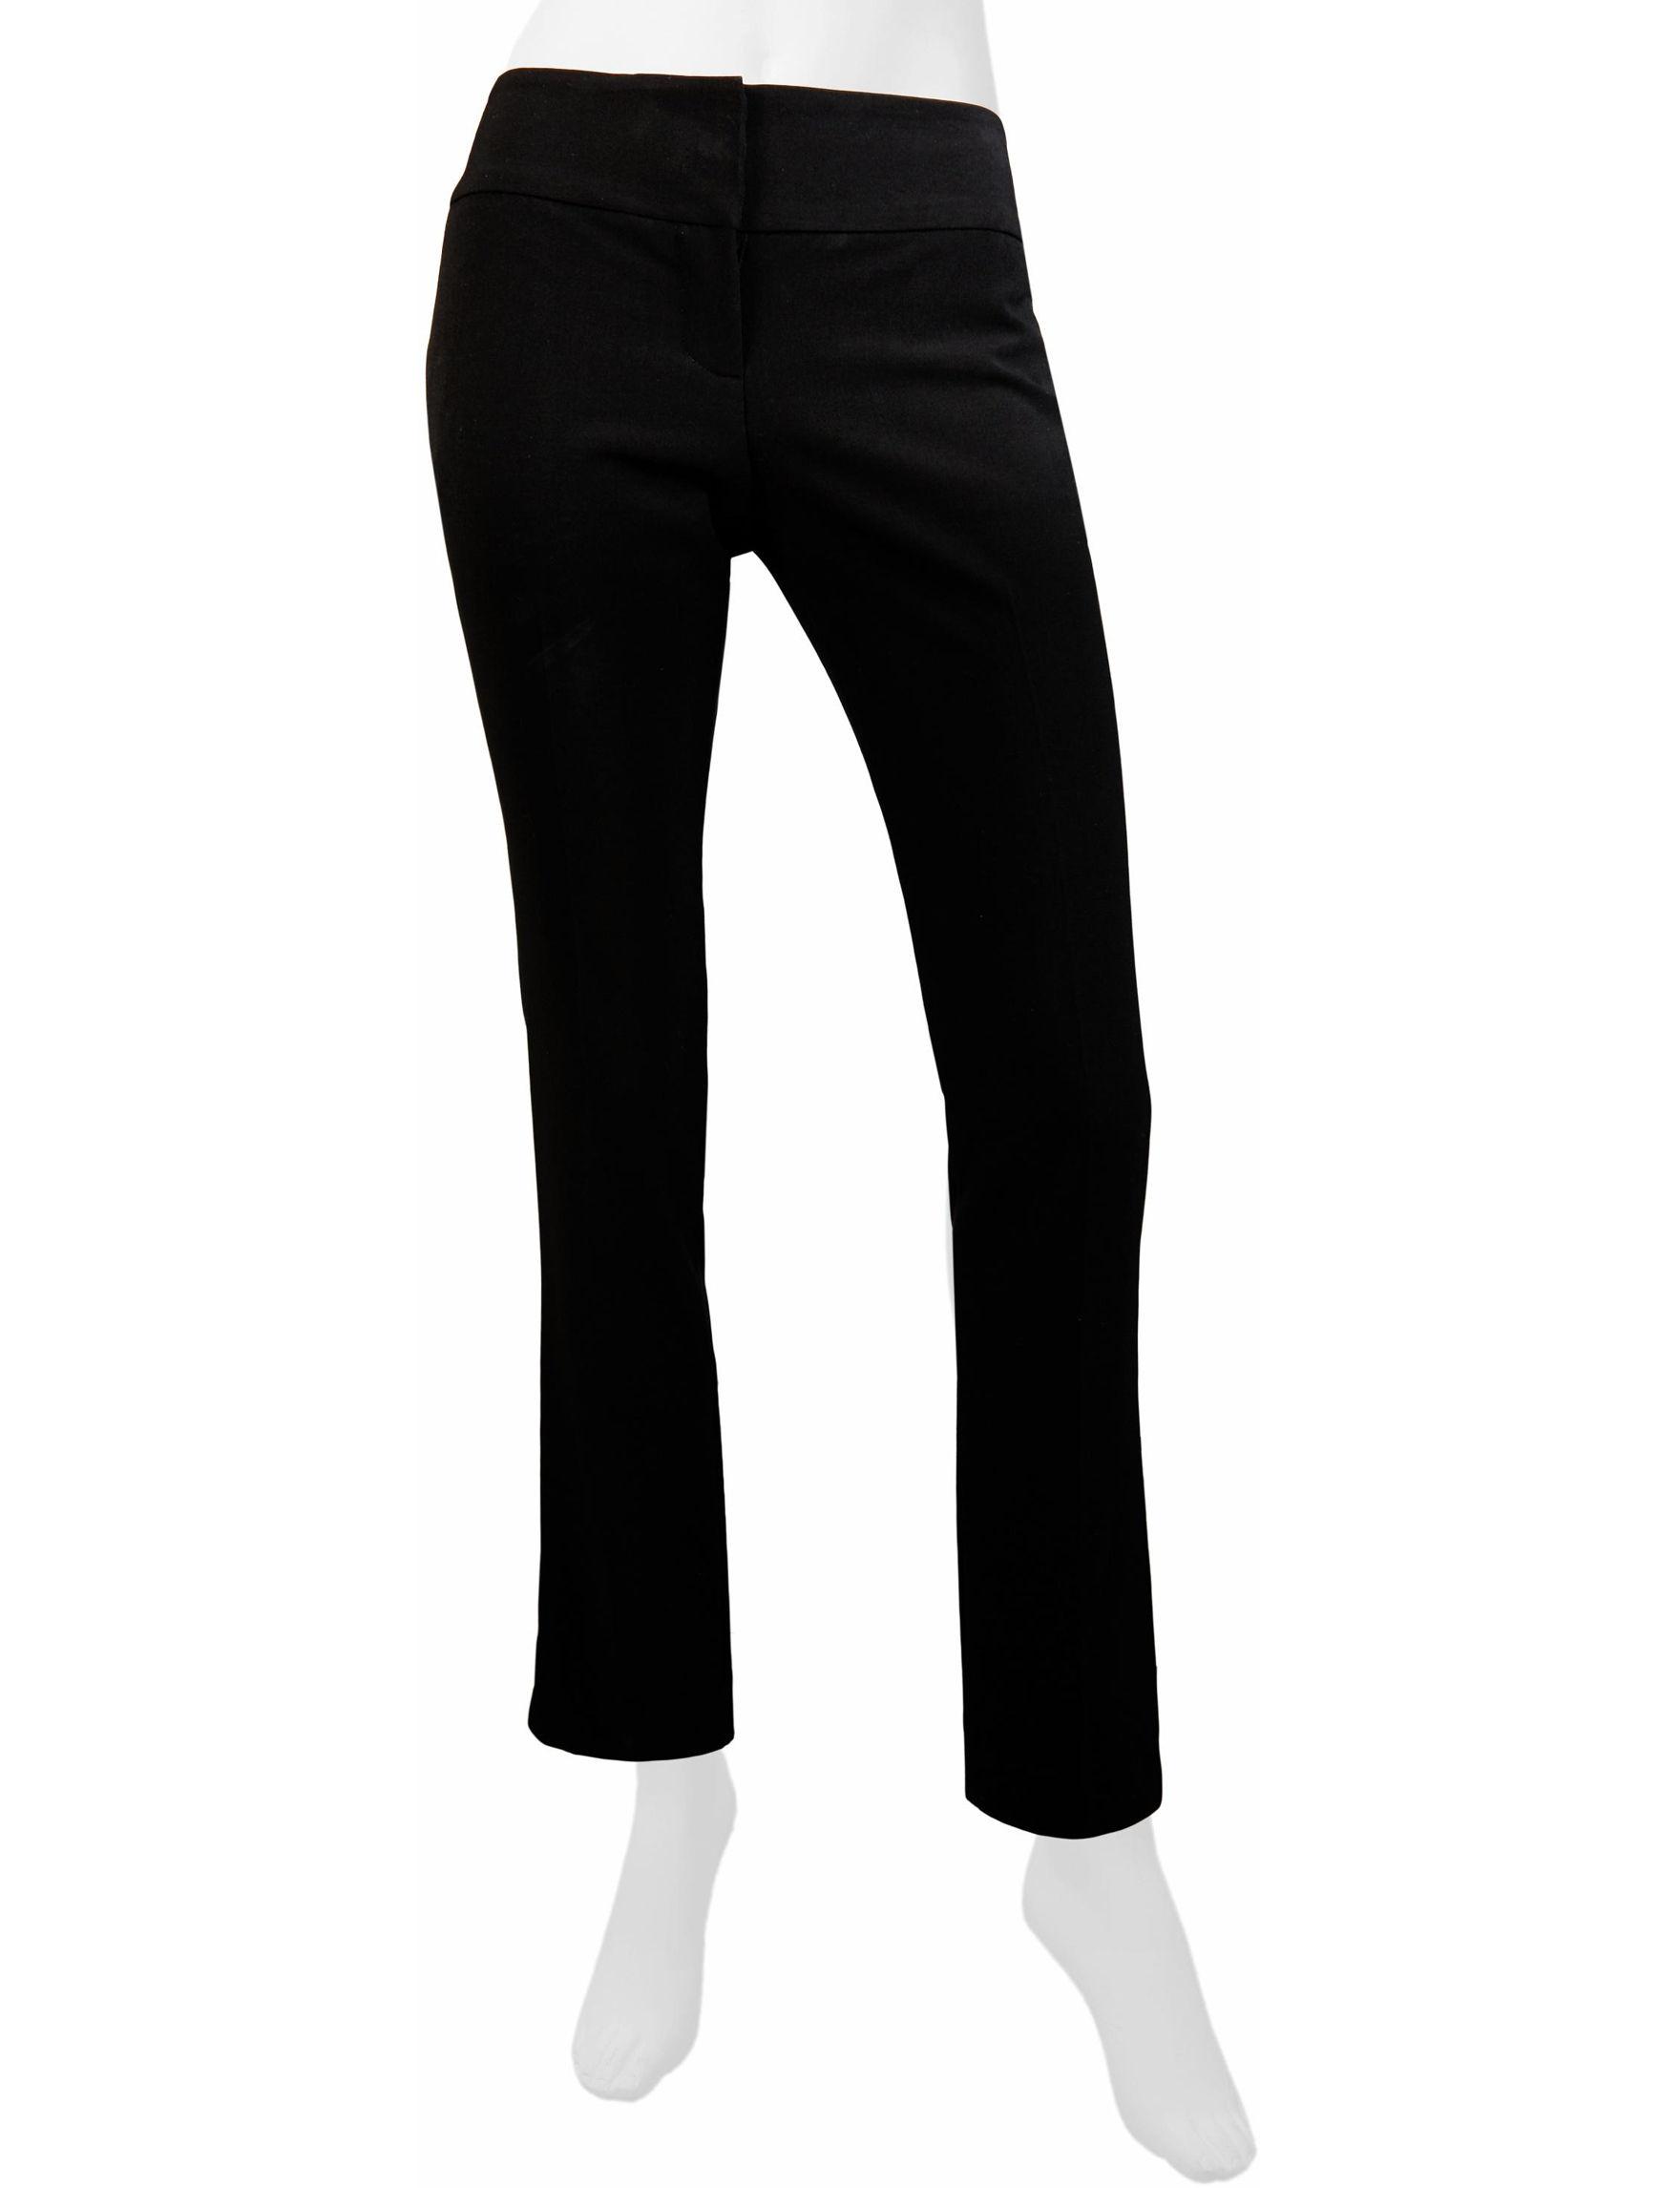 A. Byer Black Capris & Crops Relaxed Straight Skinny Slim Slim Straight